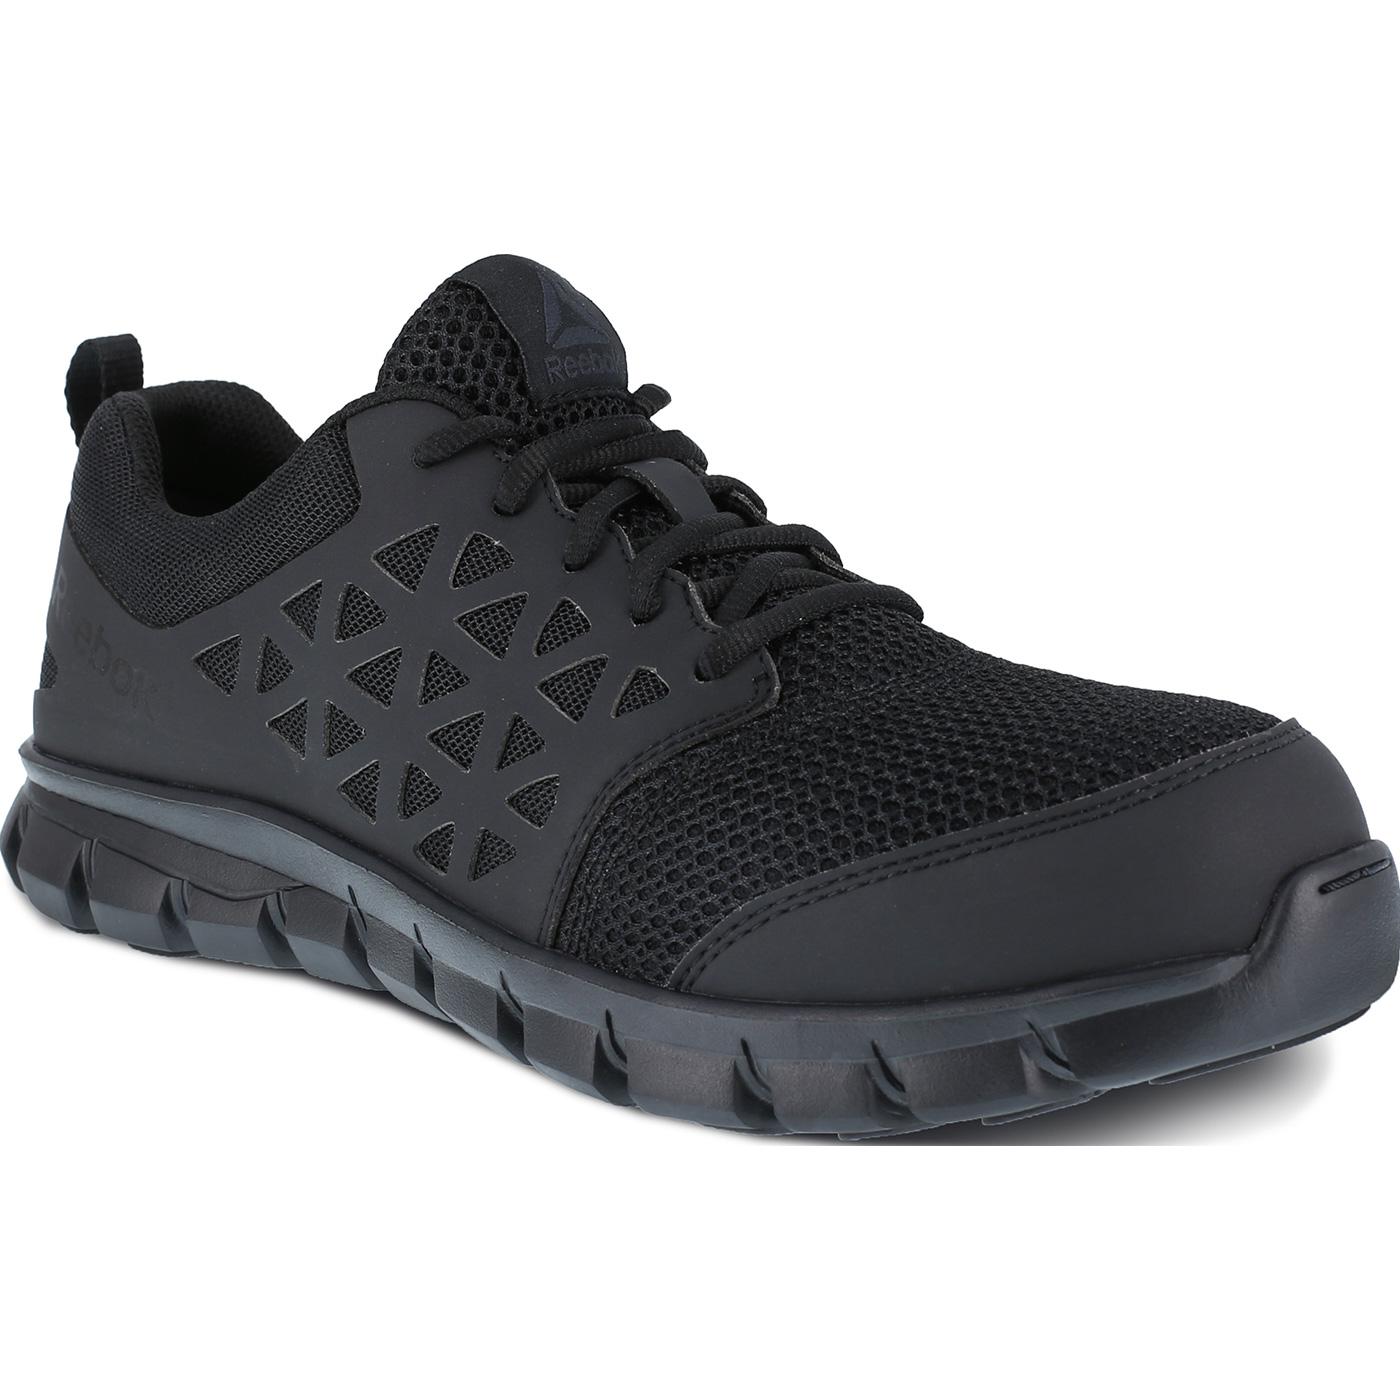 9a981515a01 Reebok Sublite Cushion Work Men s Composite Toe Static-Dissipative  Slip-Resistant Work Athletic ShoeReebok Sublite Cushion Work Men s Composite  Toe ...